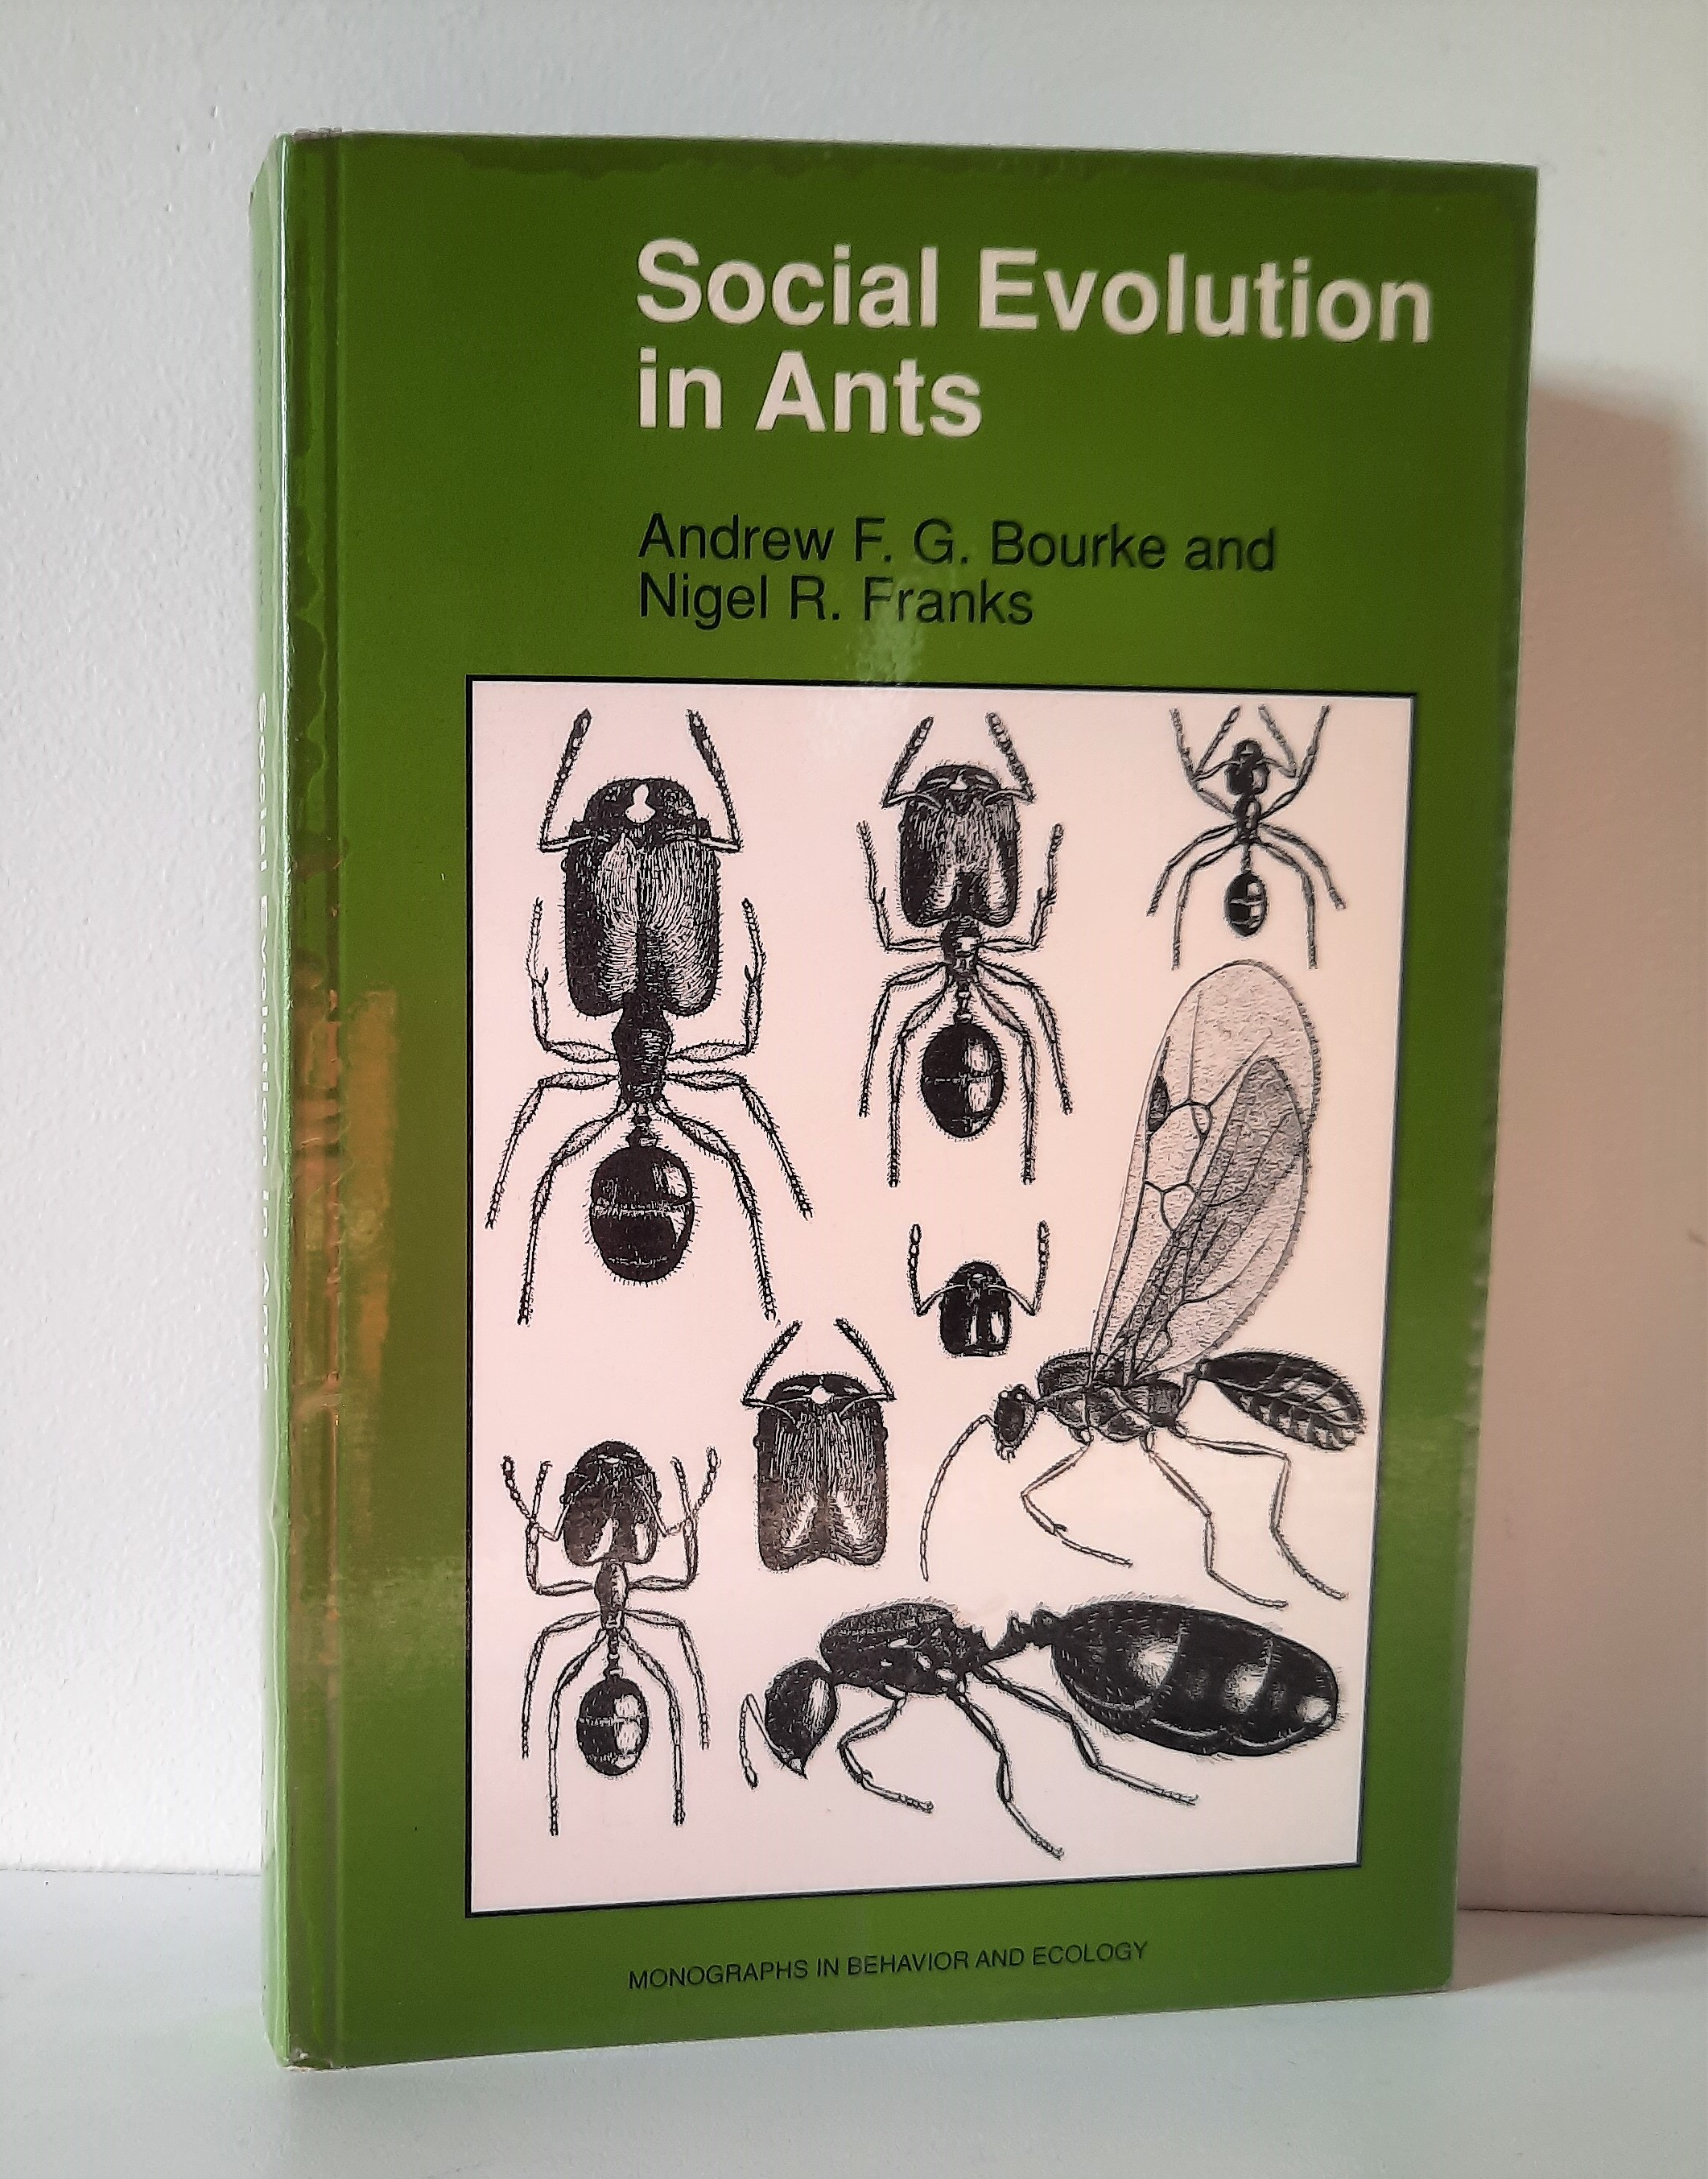 Social Evolution in Ants - Bourke, Andrew F.G.; Franks, Nigel R.